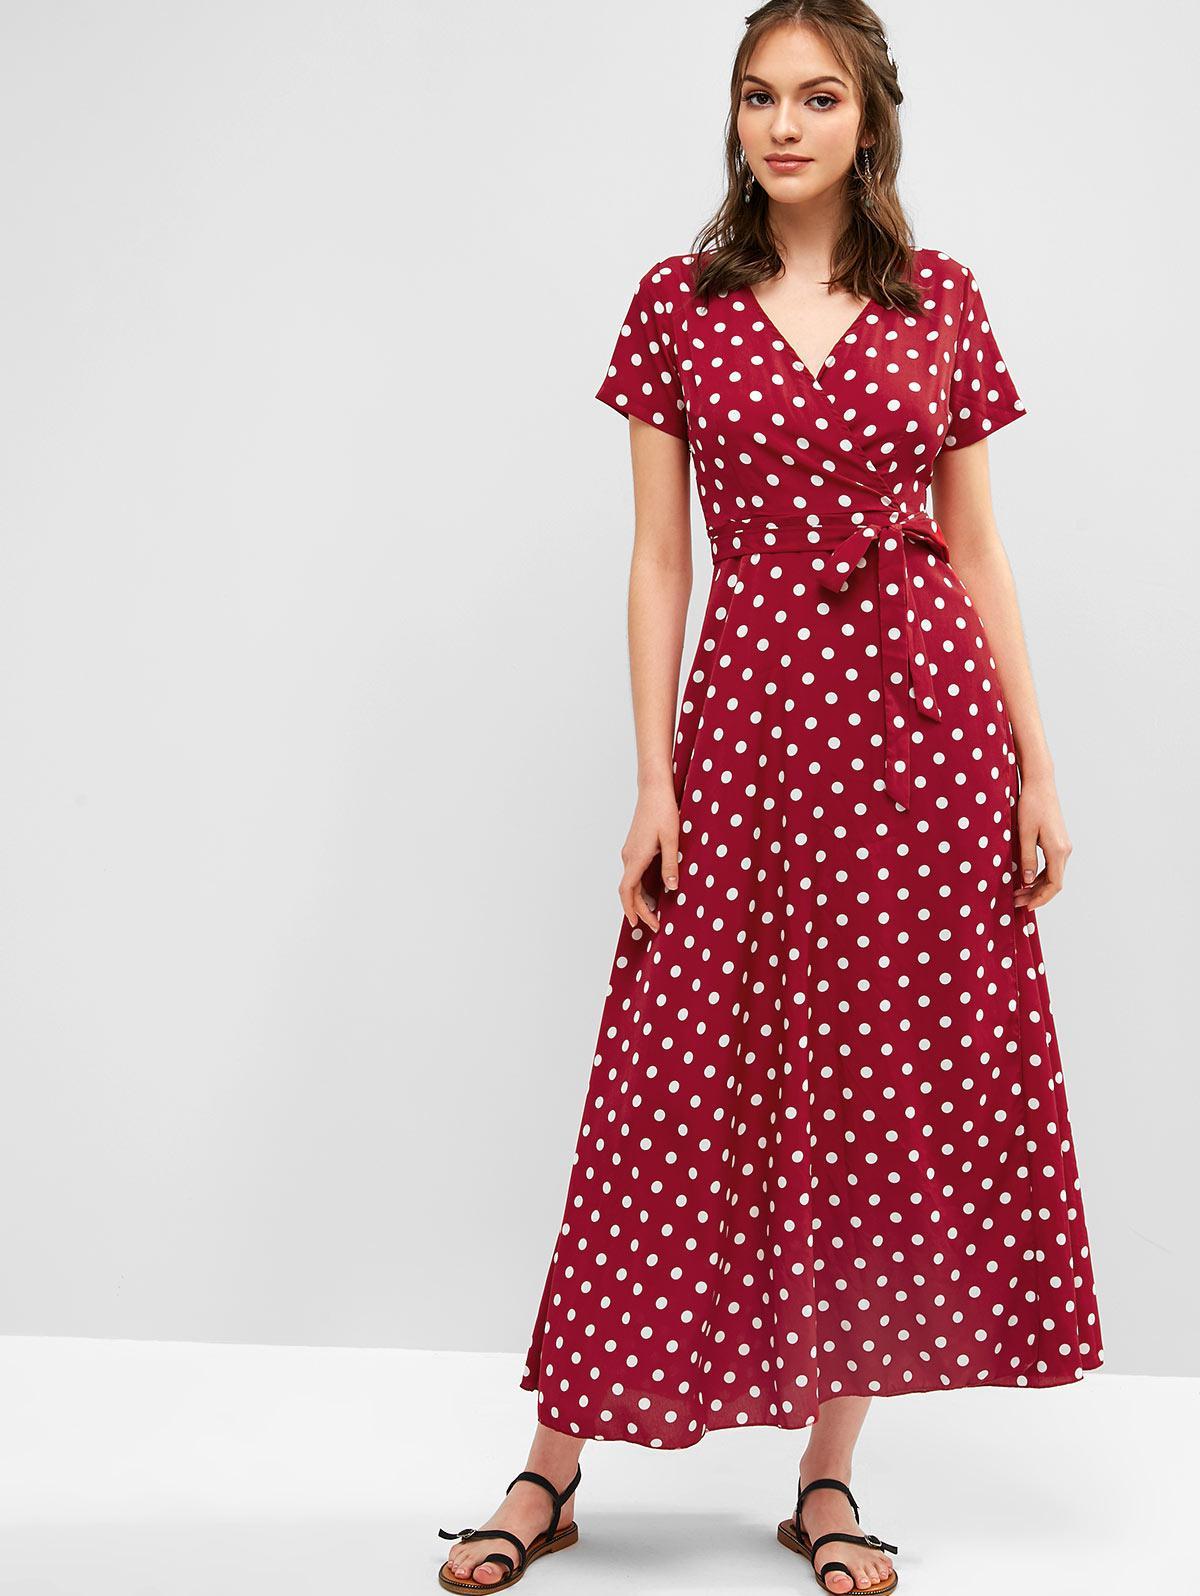 48 Off 2020 Slit Belted Surplice Polka Dot Maxi Dress In Red Zaful